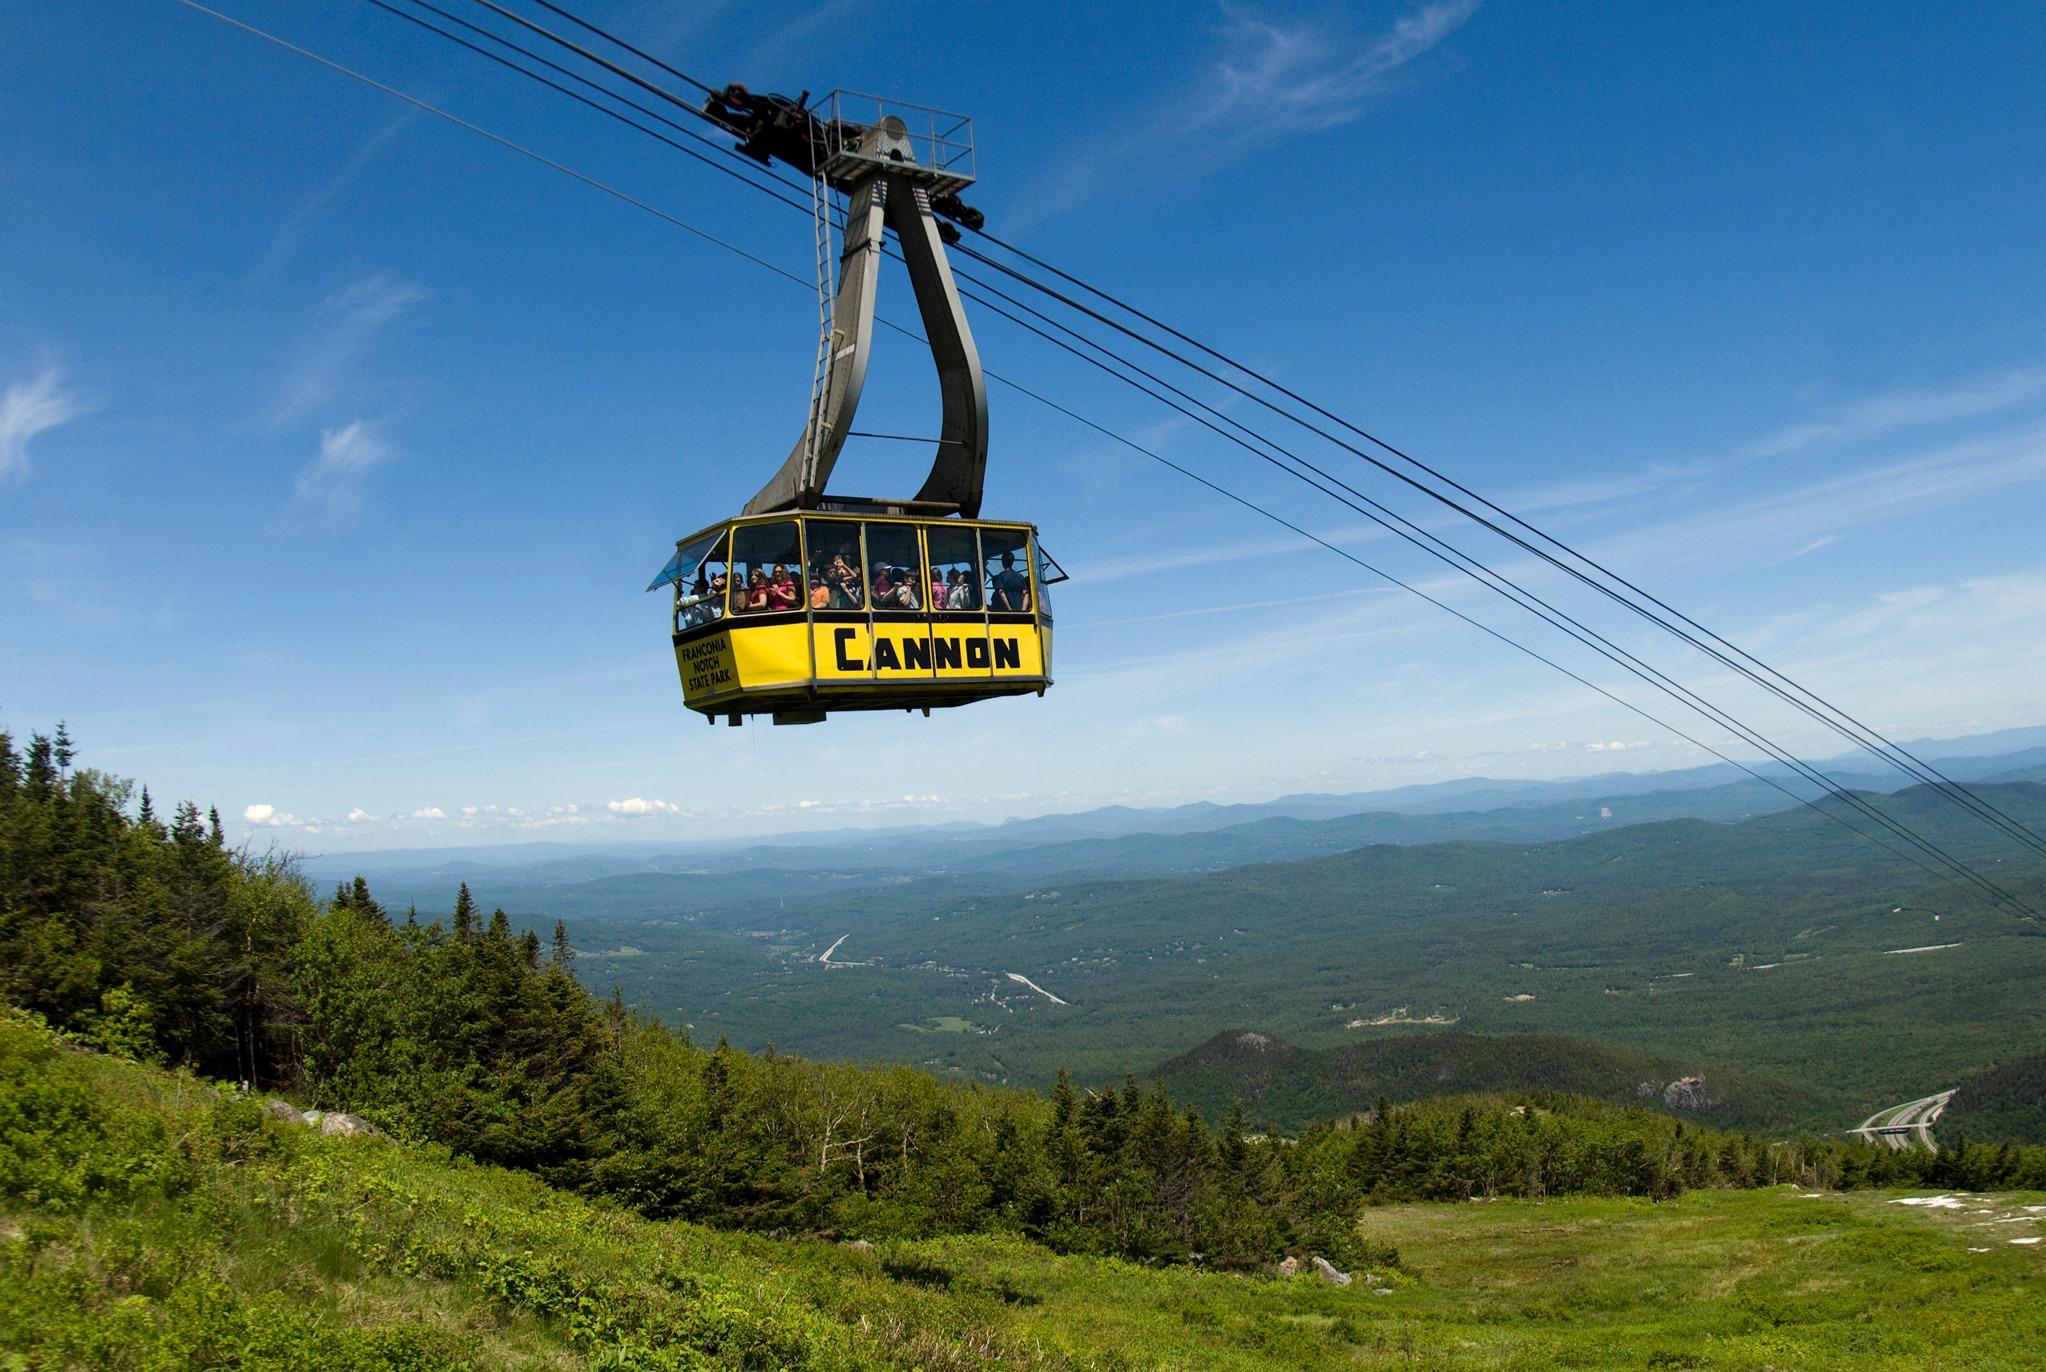 Cannon Mountain Resort